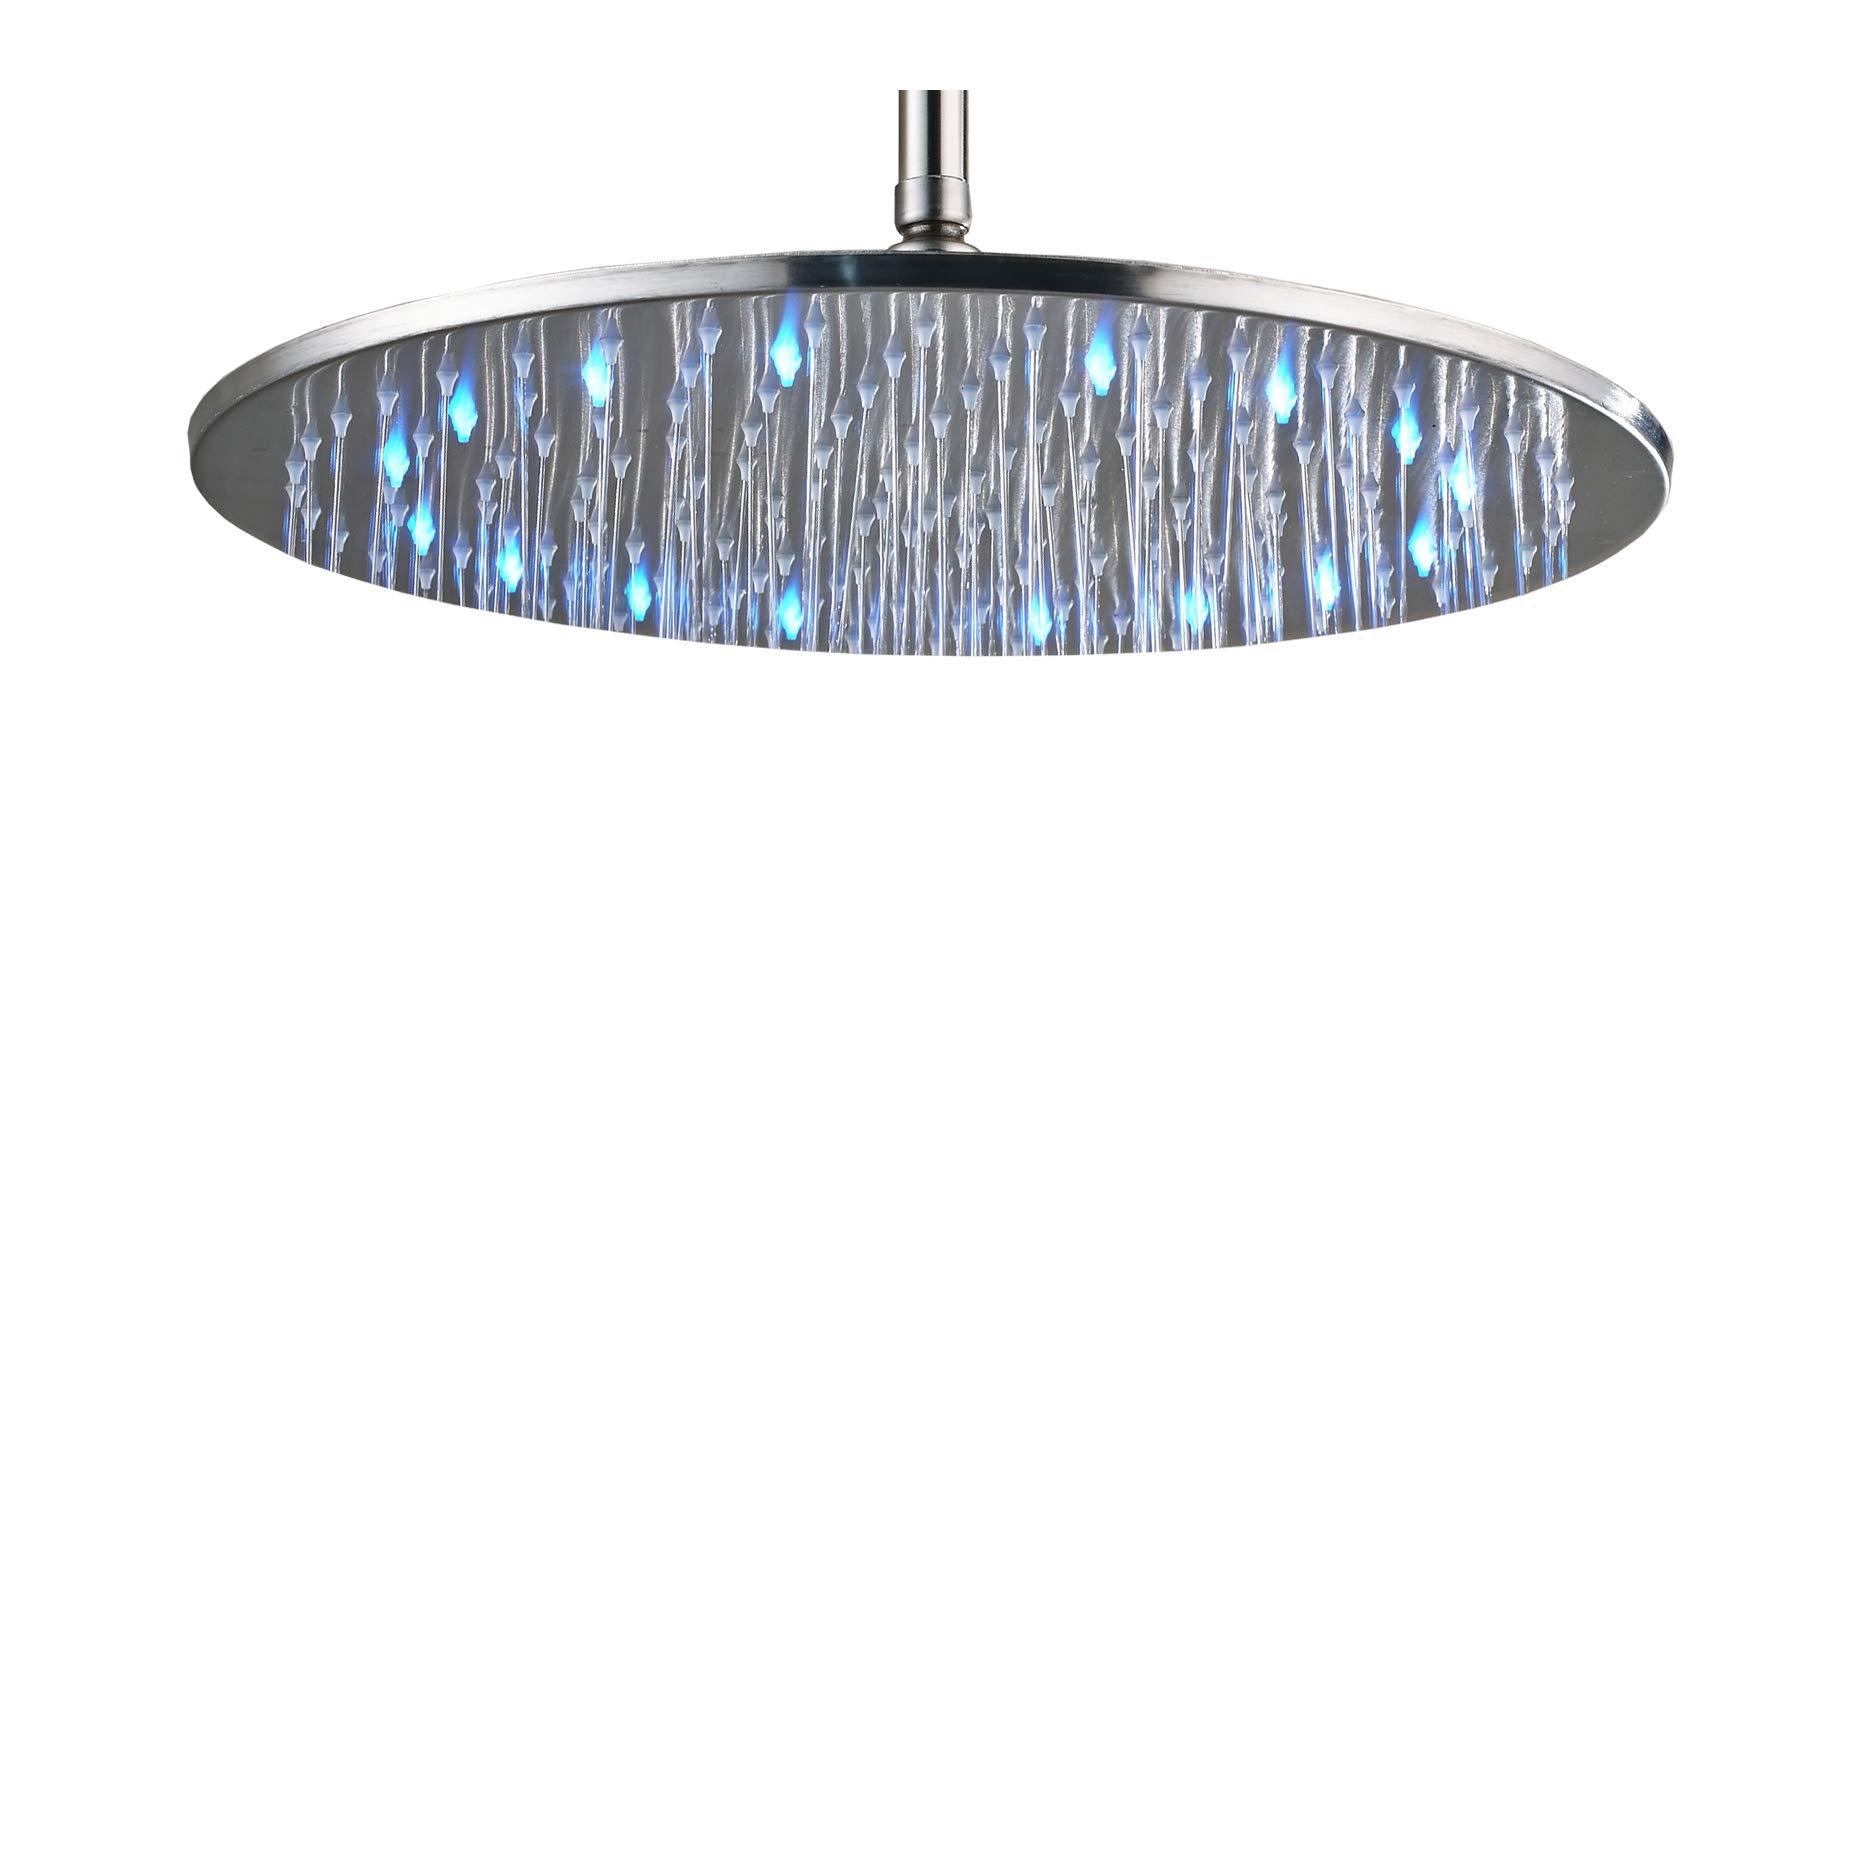 Rozin Bathroom LED Color 16-inch Round Rainfall Shower Head Overhead Spray Brushed Nickel